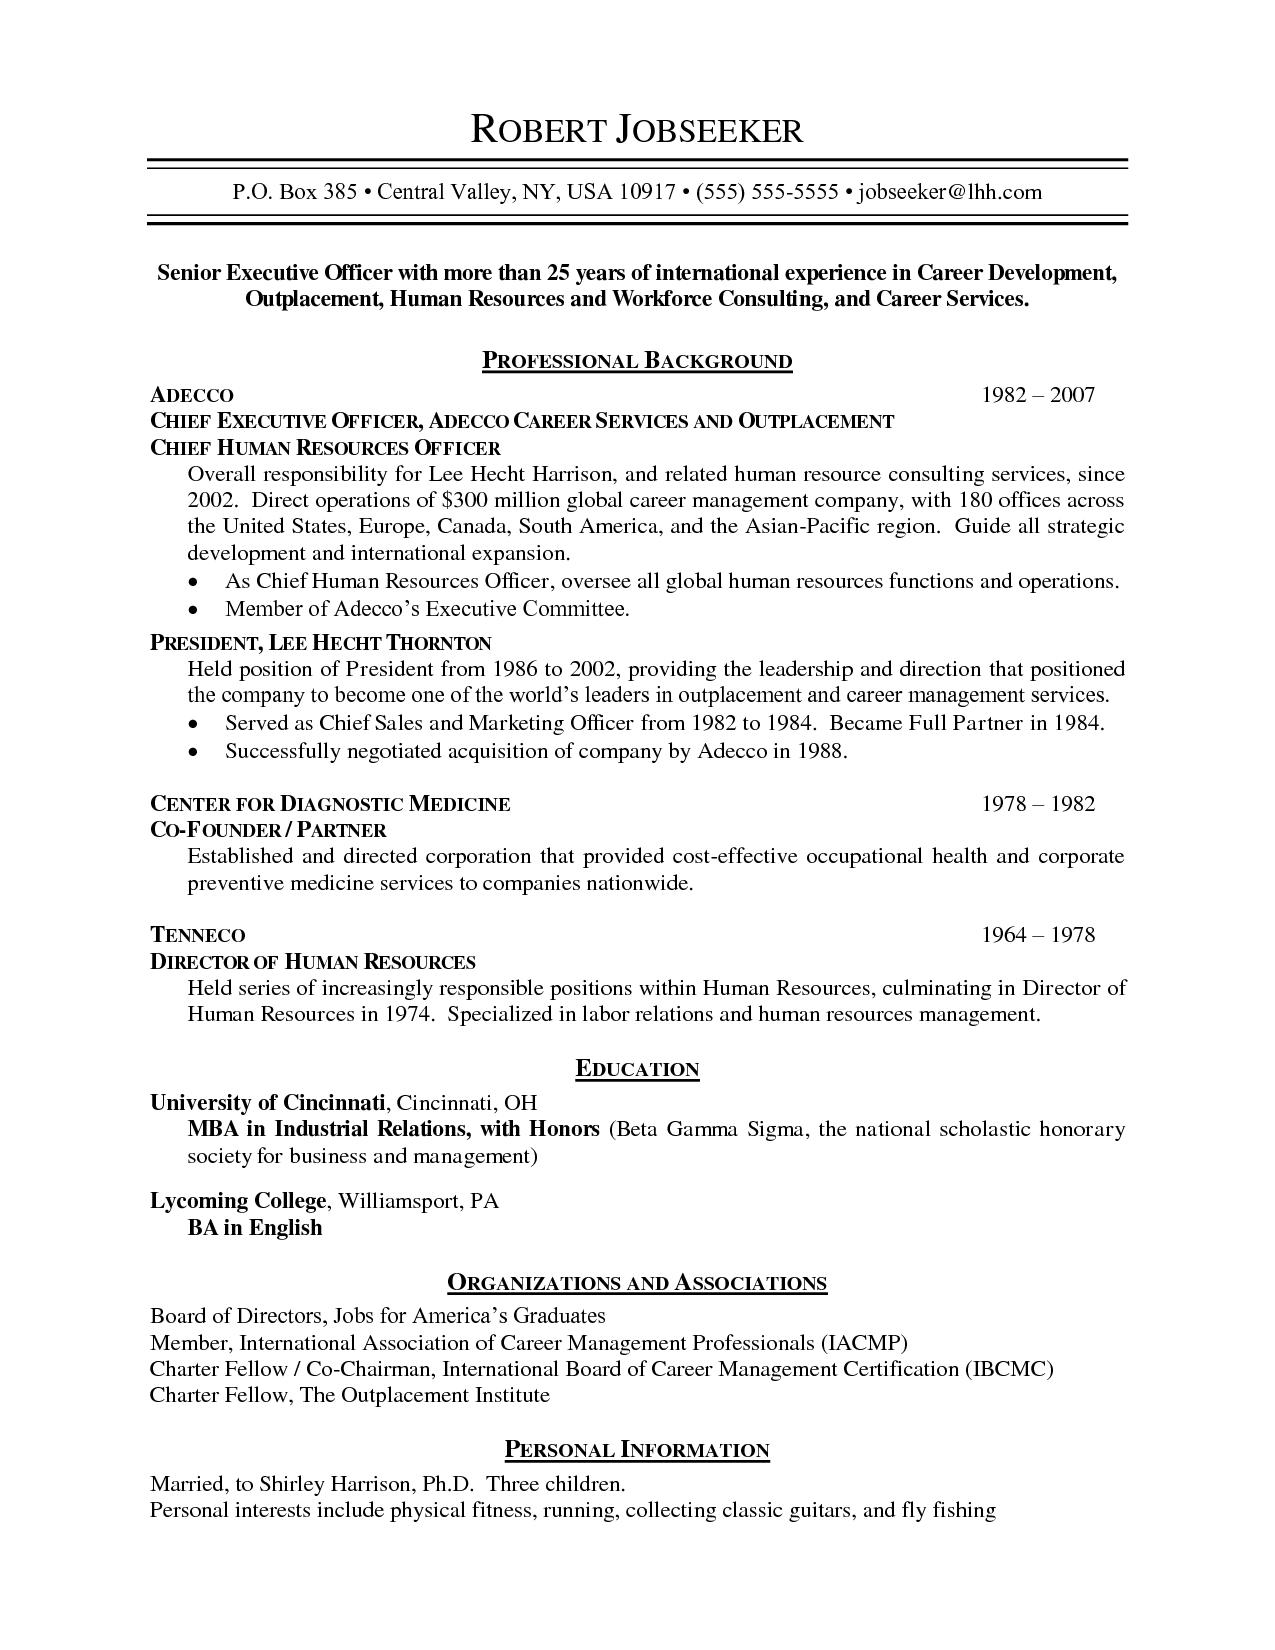 resume format not chronological chronological format resume